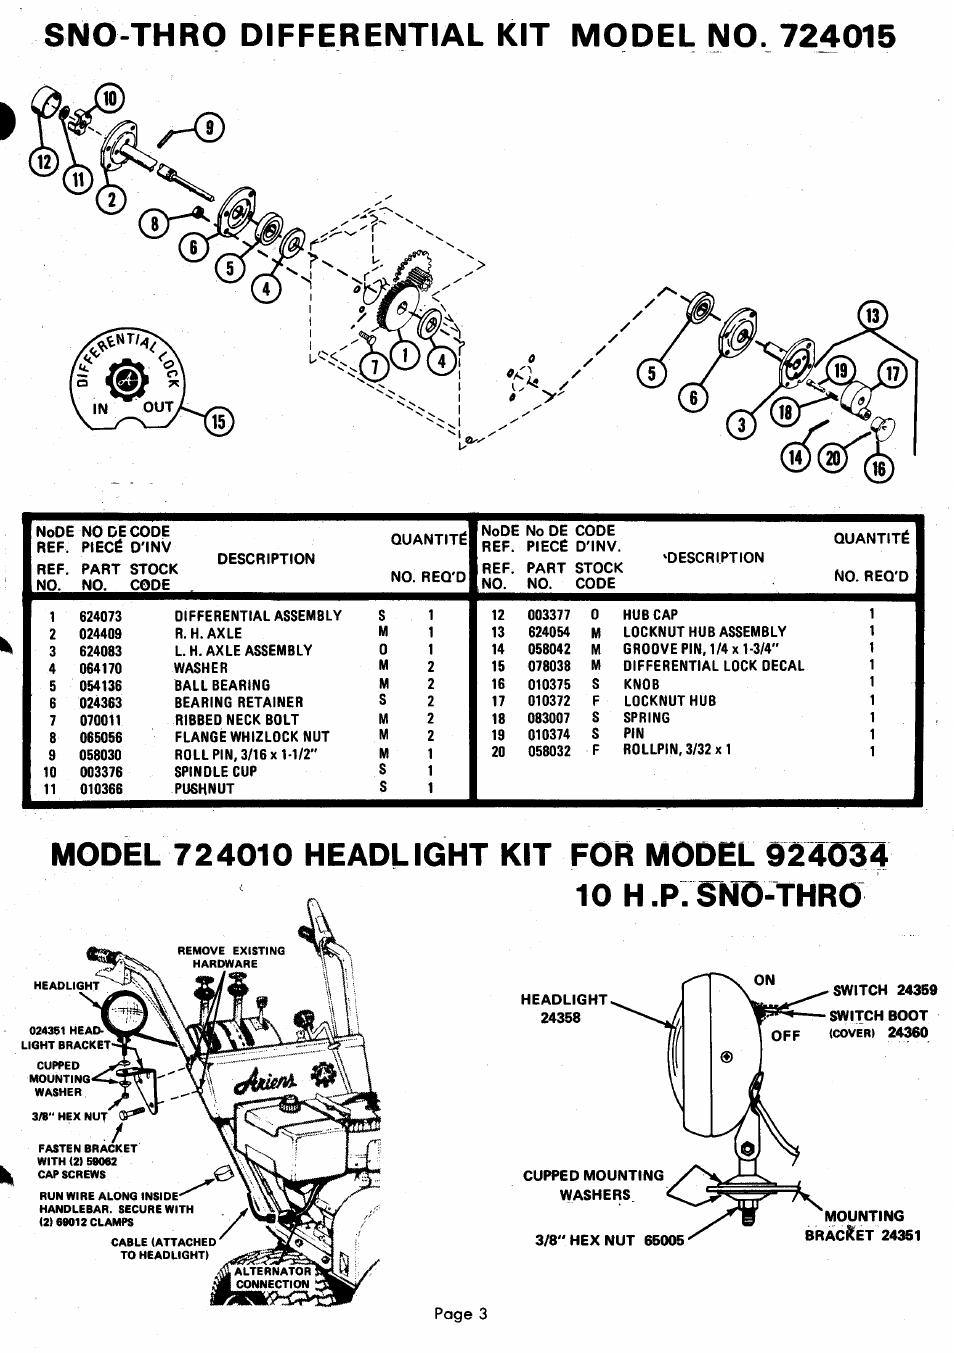 Sno-thro differential kit model no. 724015, Model 724010